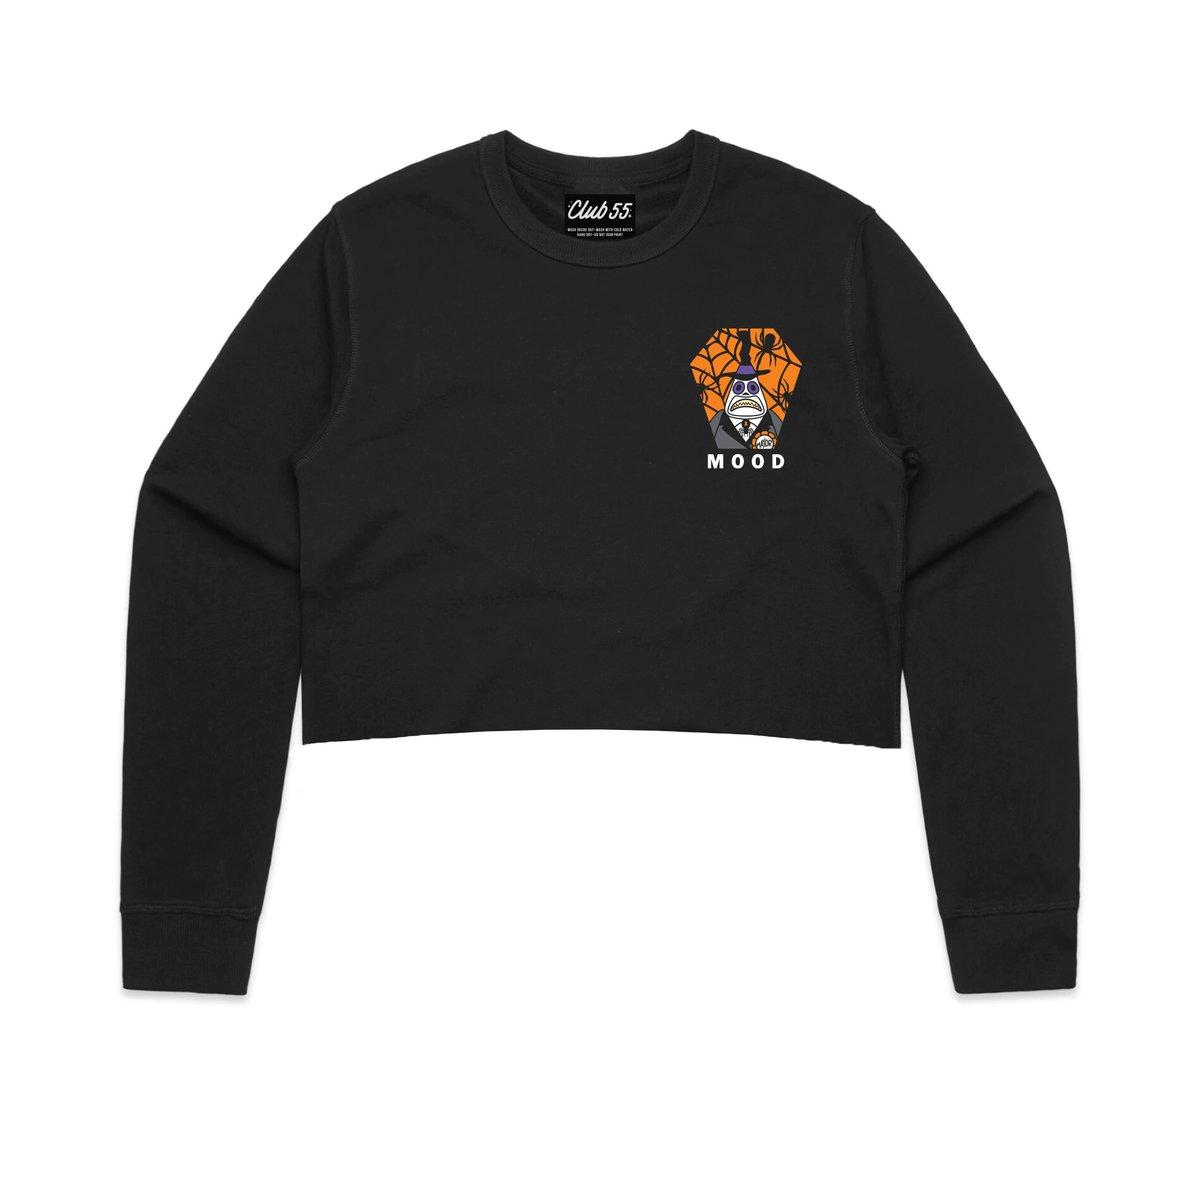 Image of Mood Crop Crewneck Sweatshirt